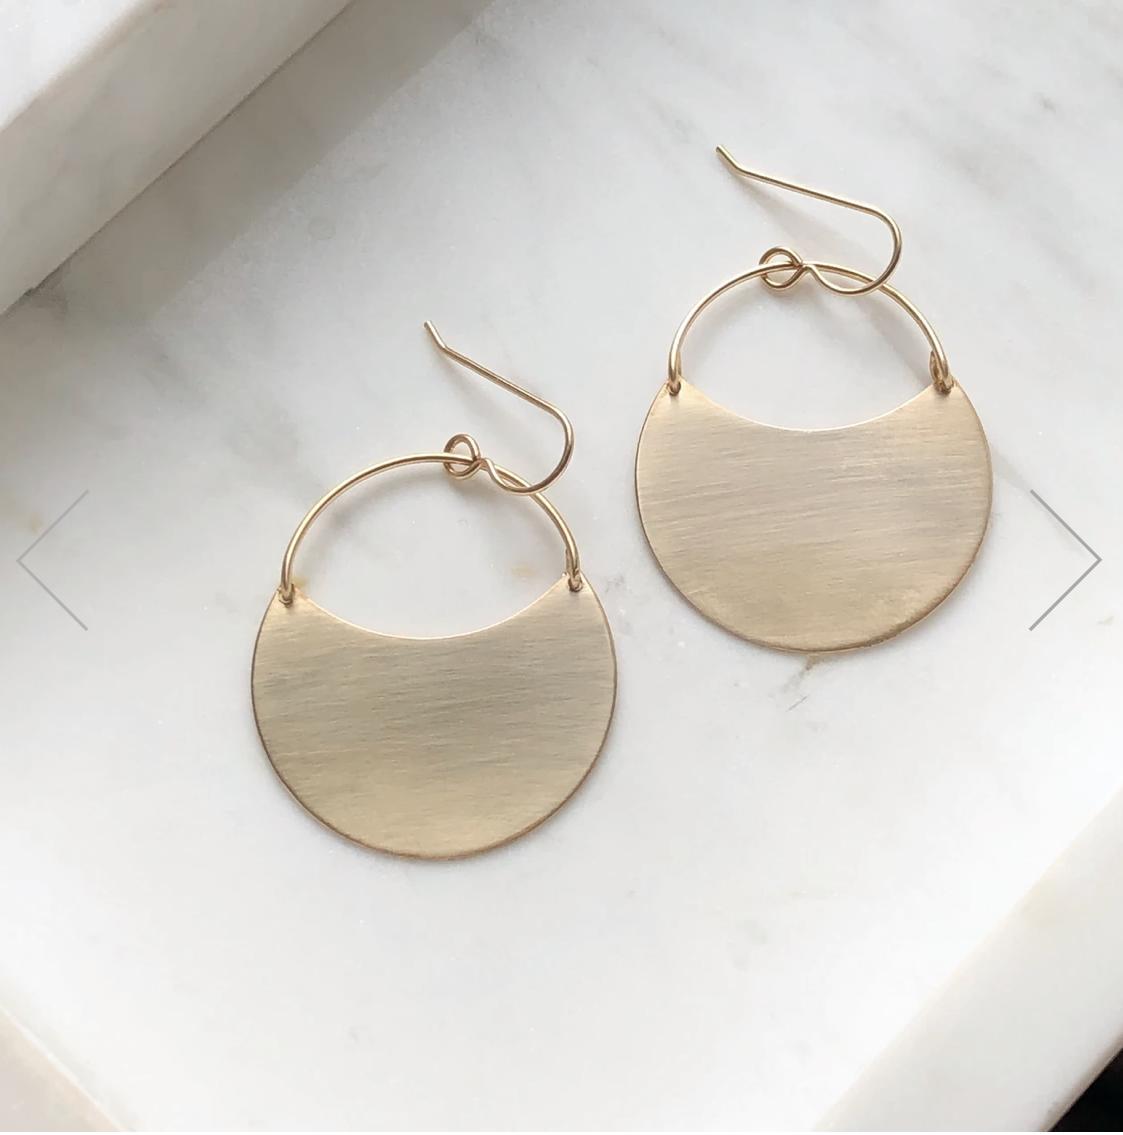 Token Jewelry - theia earrings from